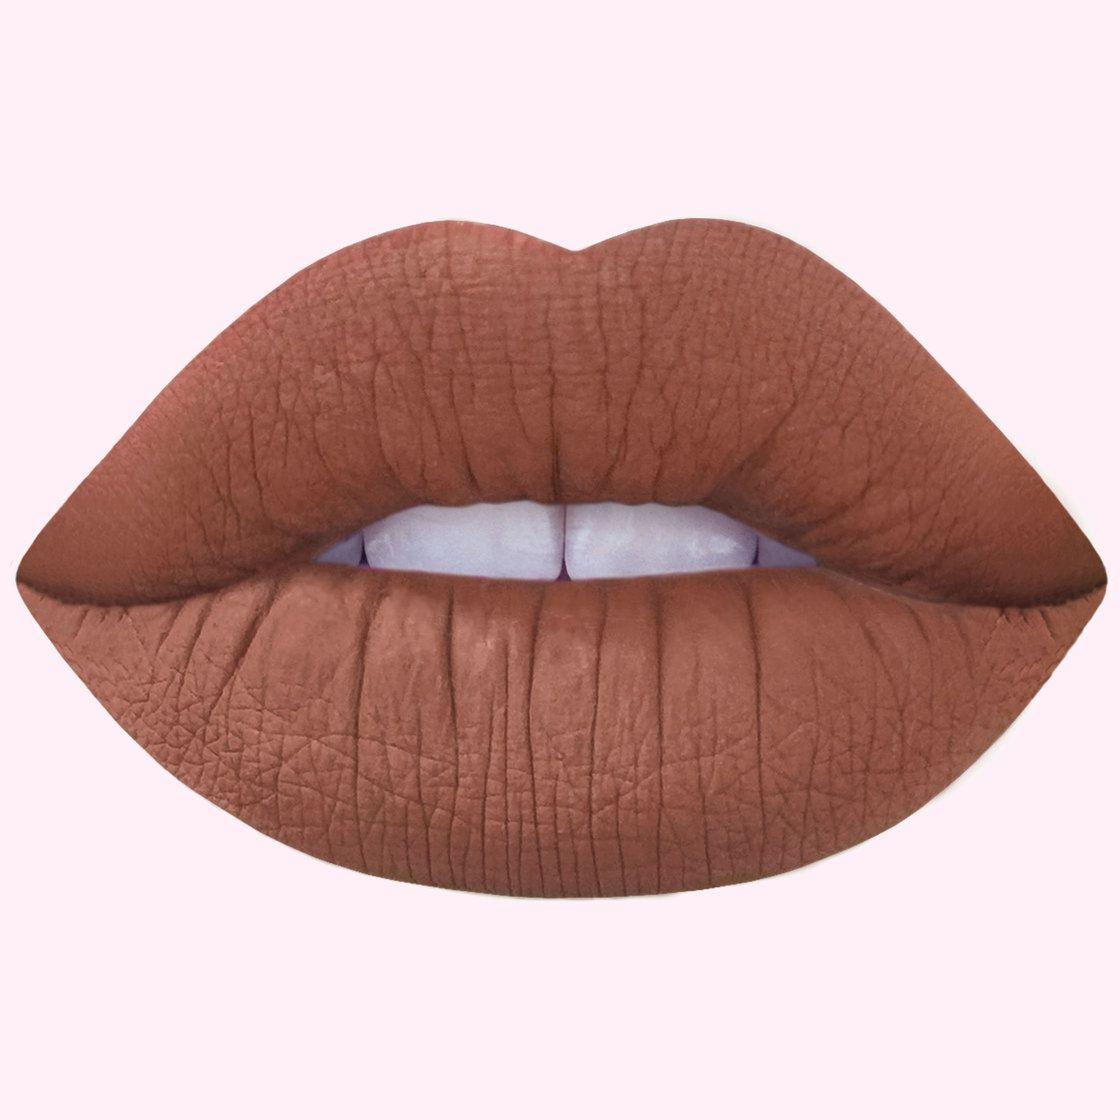 Shroom limecrime lipstick